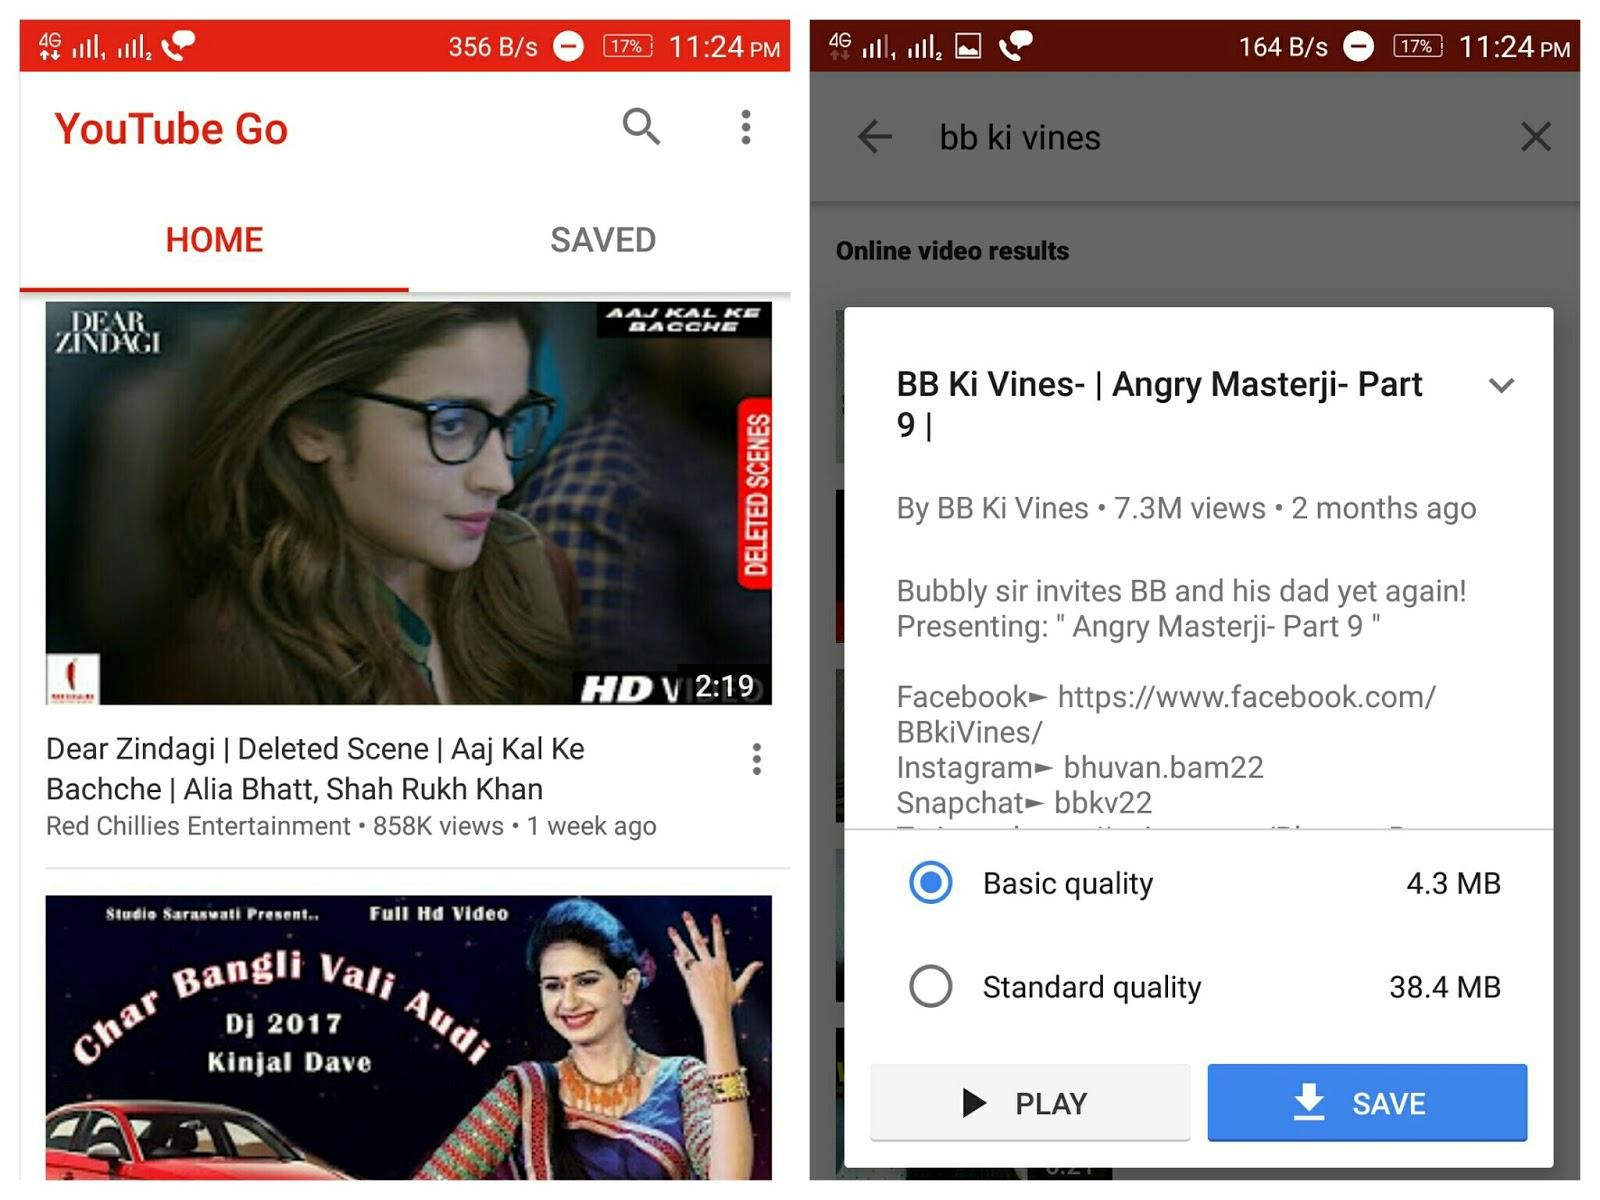 Youtube Go Download,youtube Go India,youtubego Free Download,new Youtube Go,